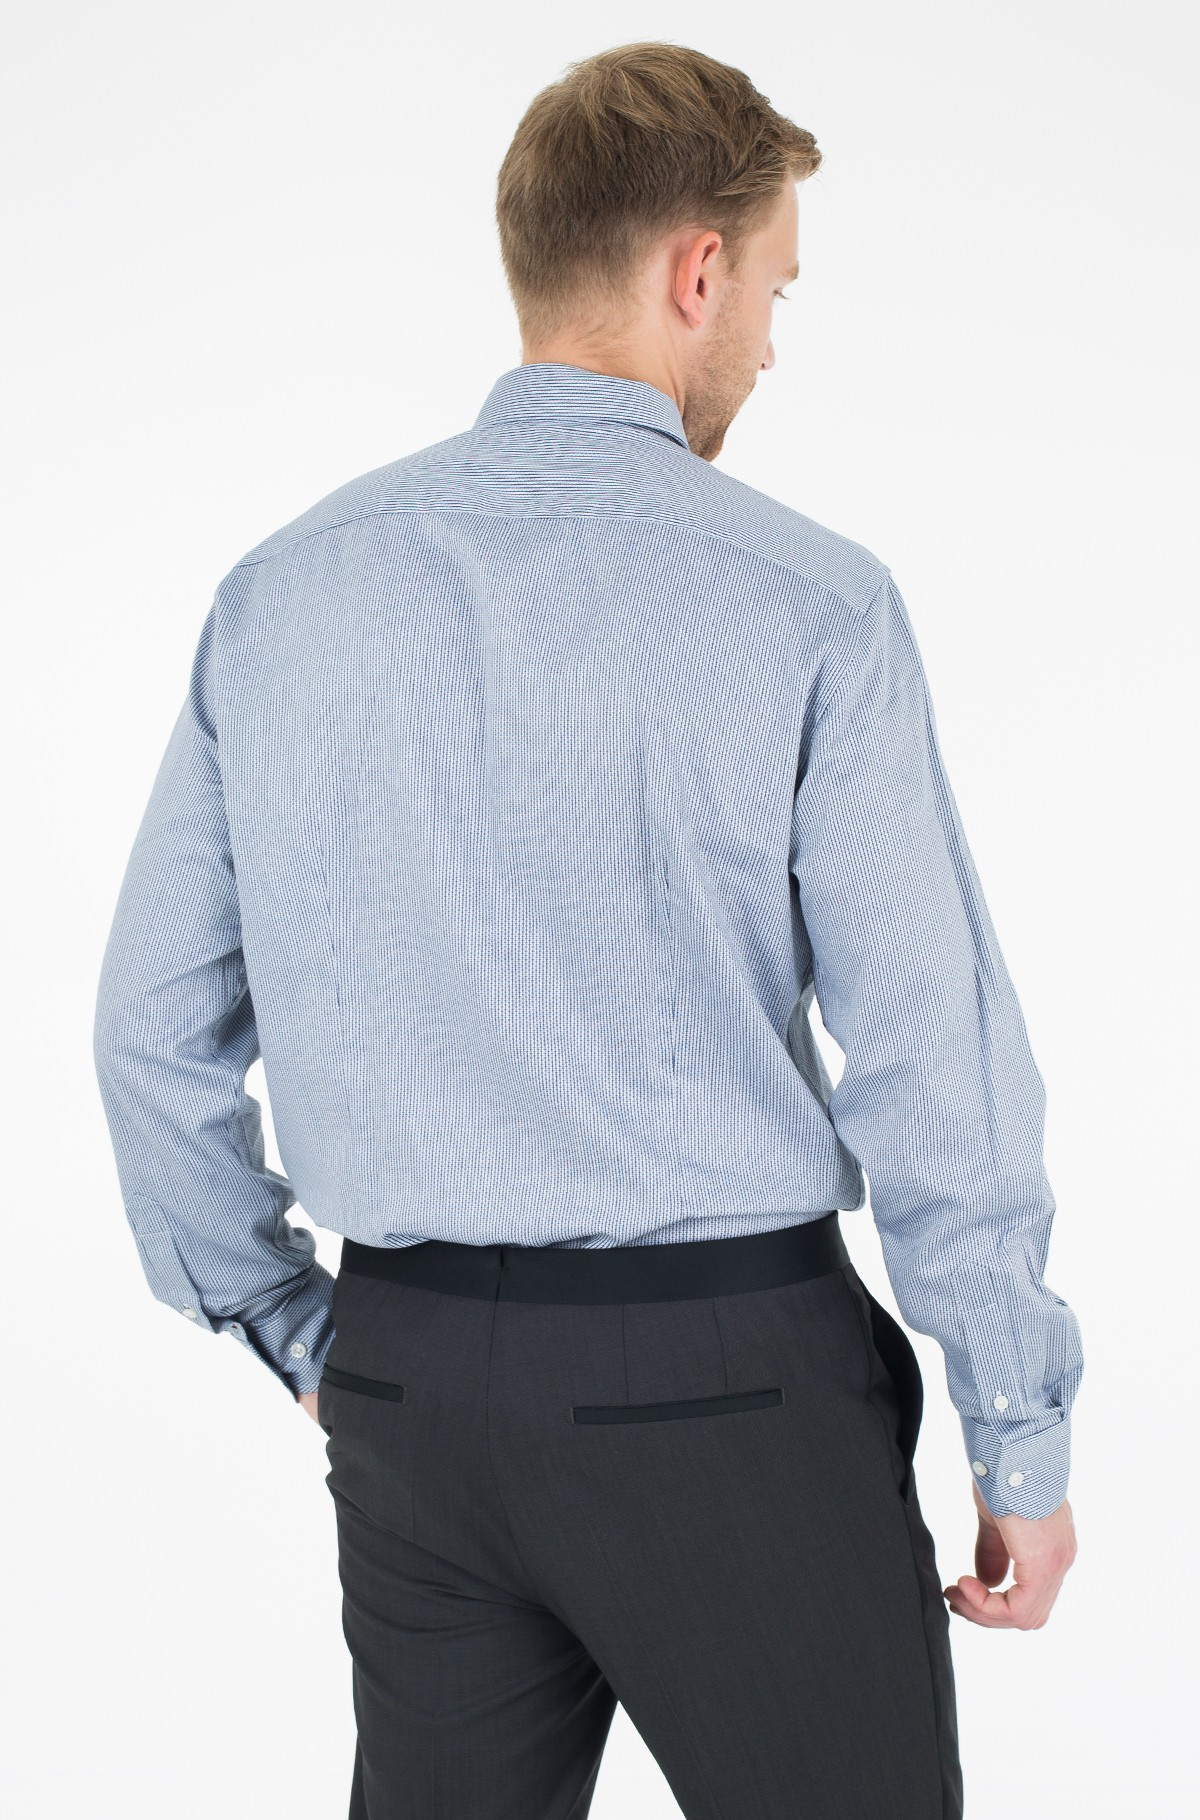 Shirt JAK SHTDSN17309-full-2